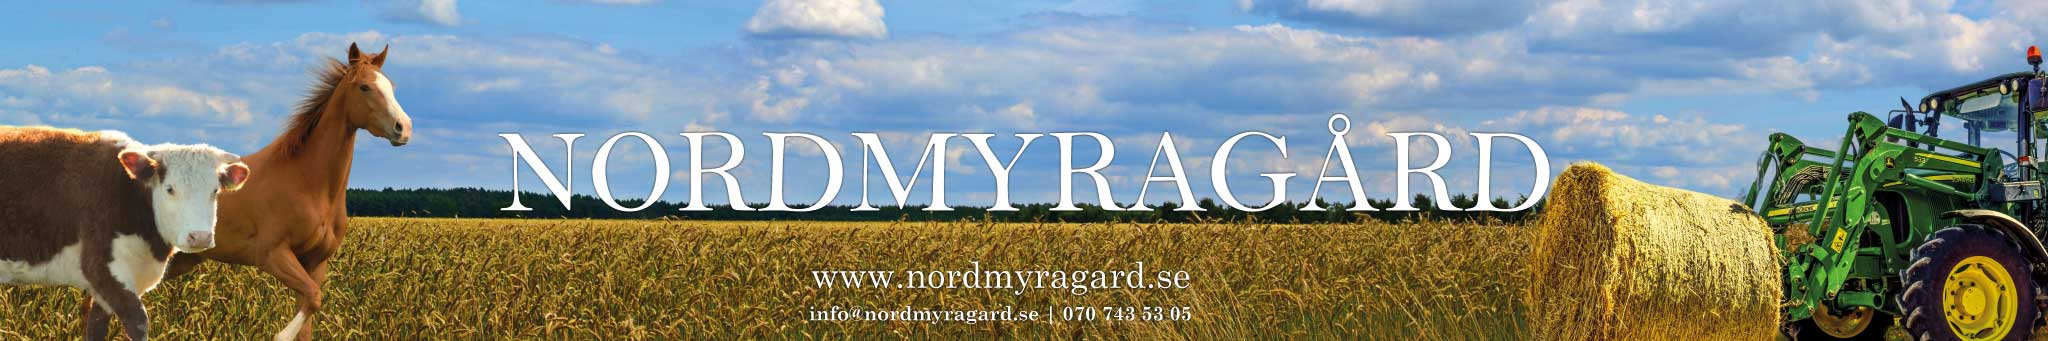 Nordmyra Gård Logotyp